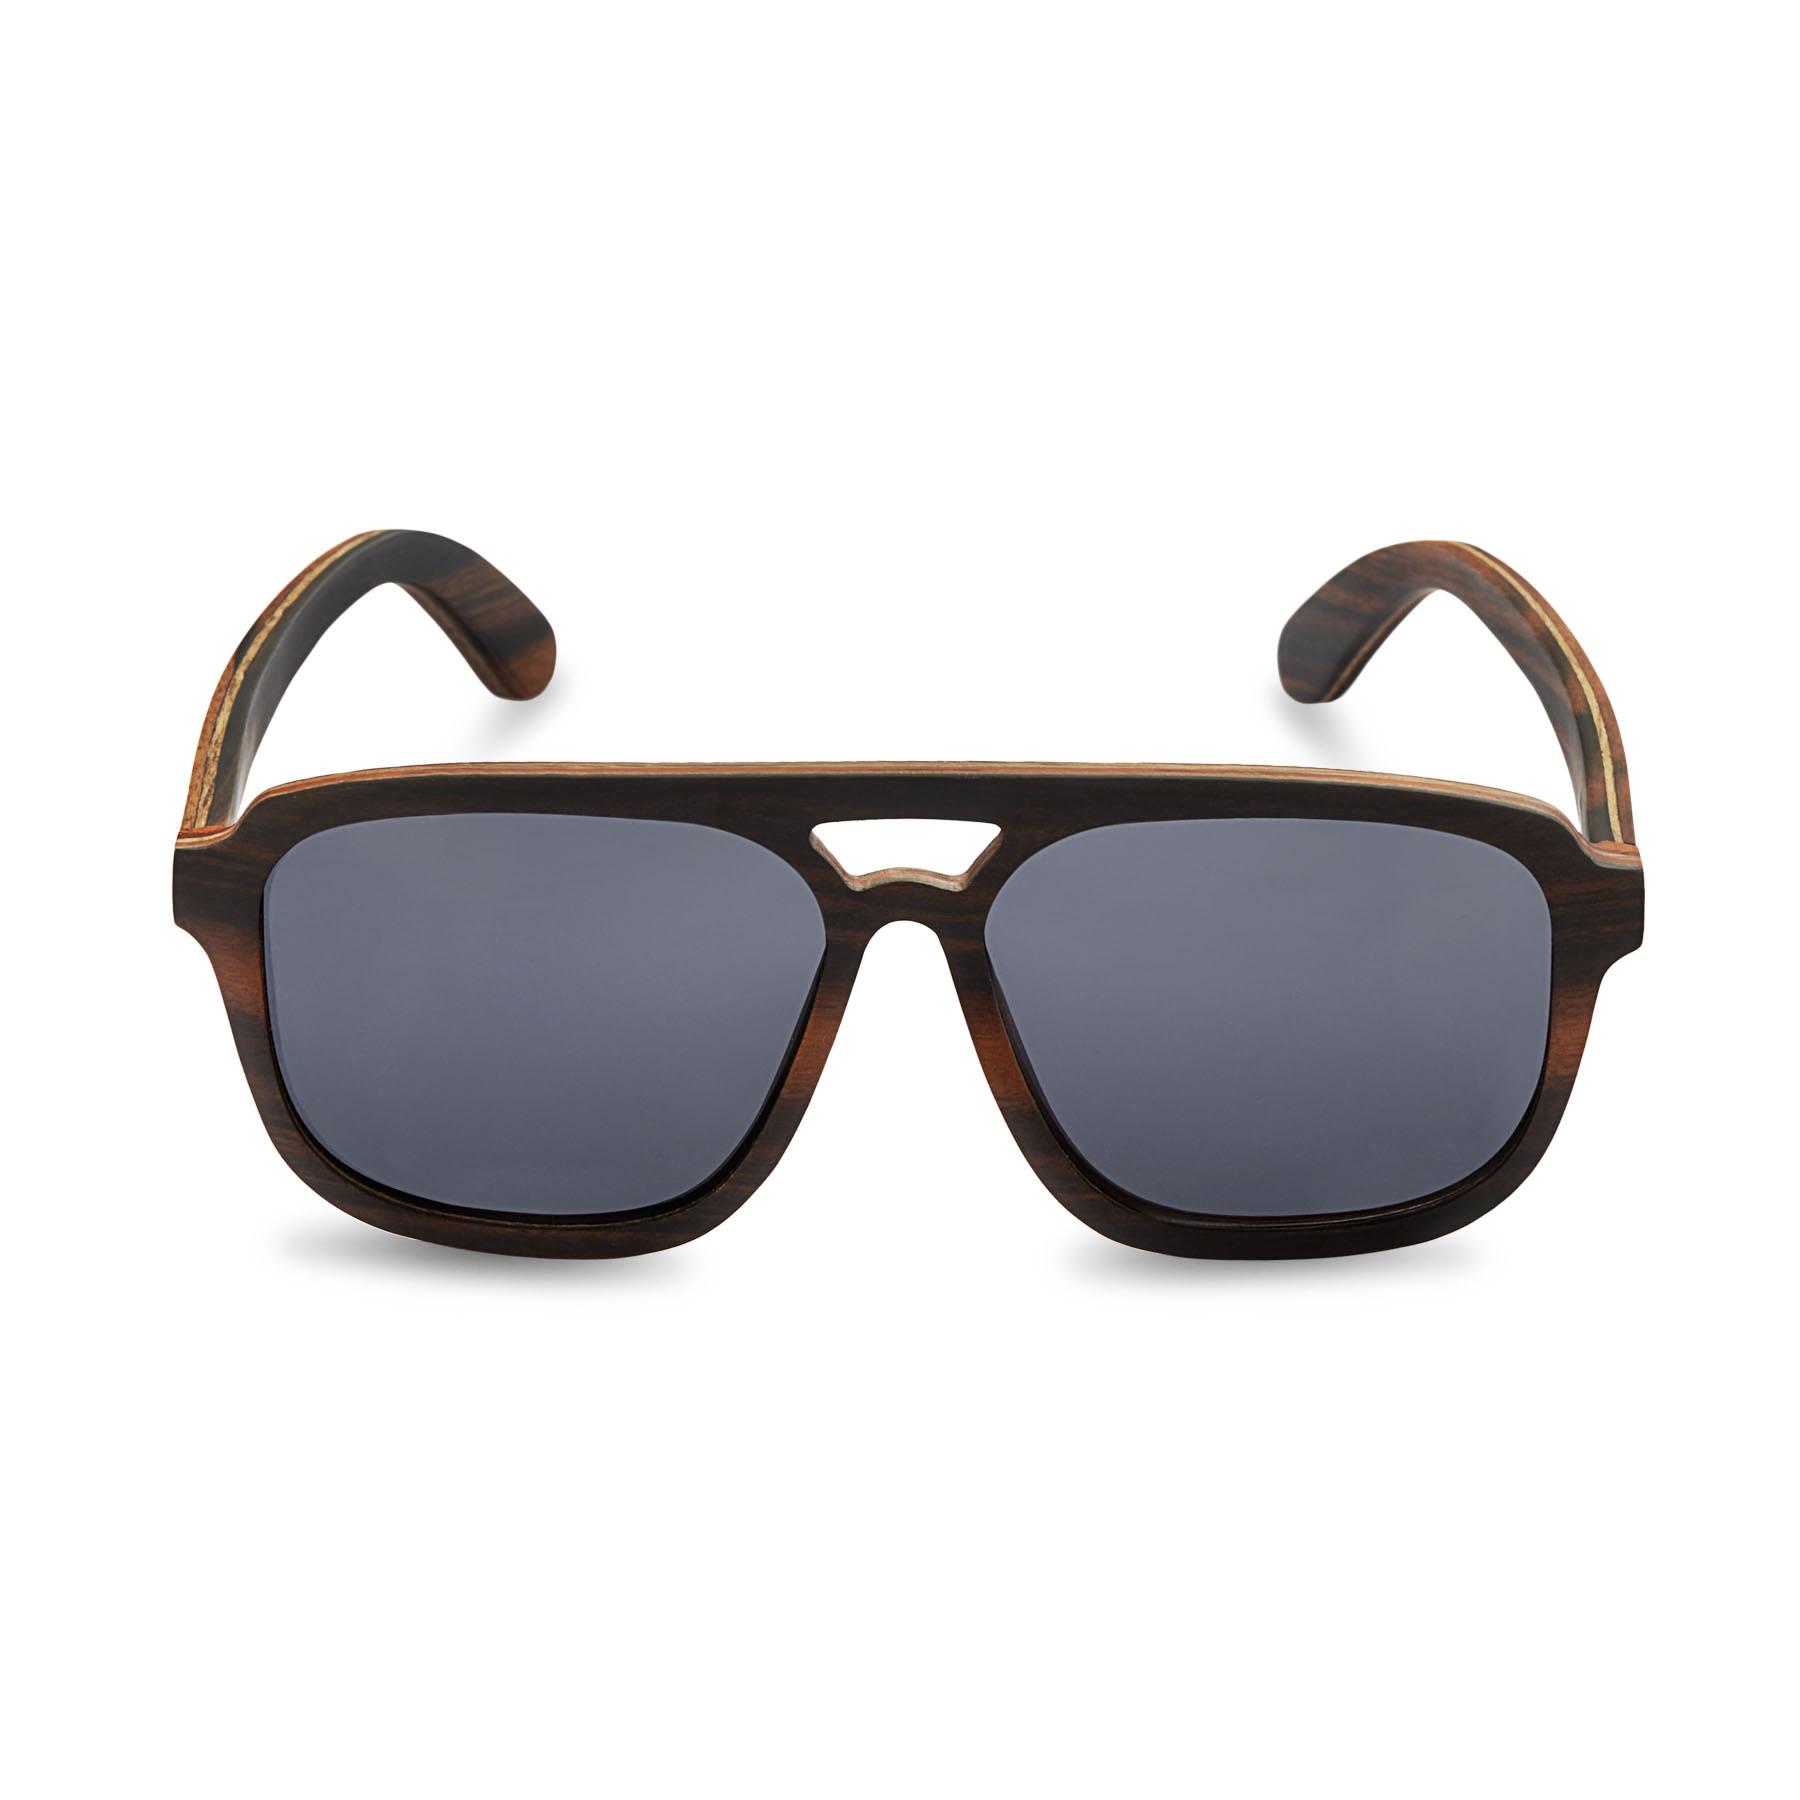 536aaf8878b08 Caprio Unisex Wooden Double Bridge Aviator Sunglasses